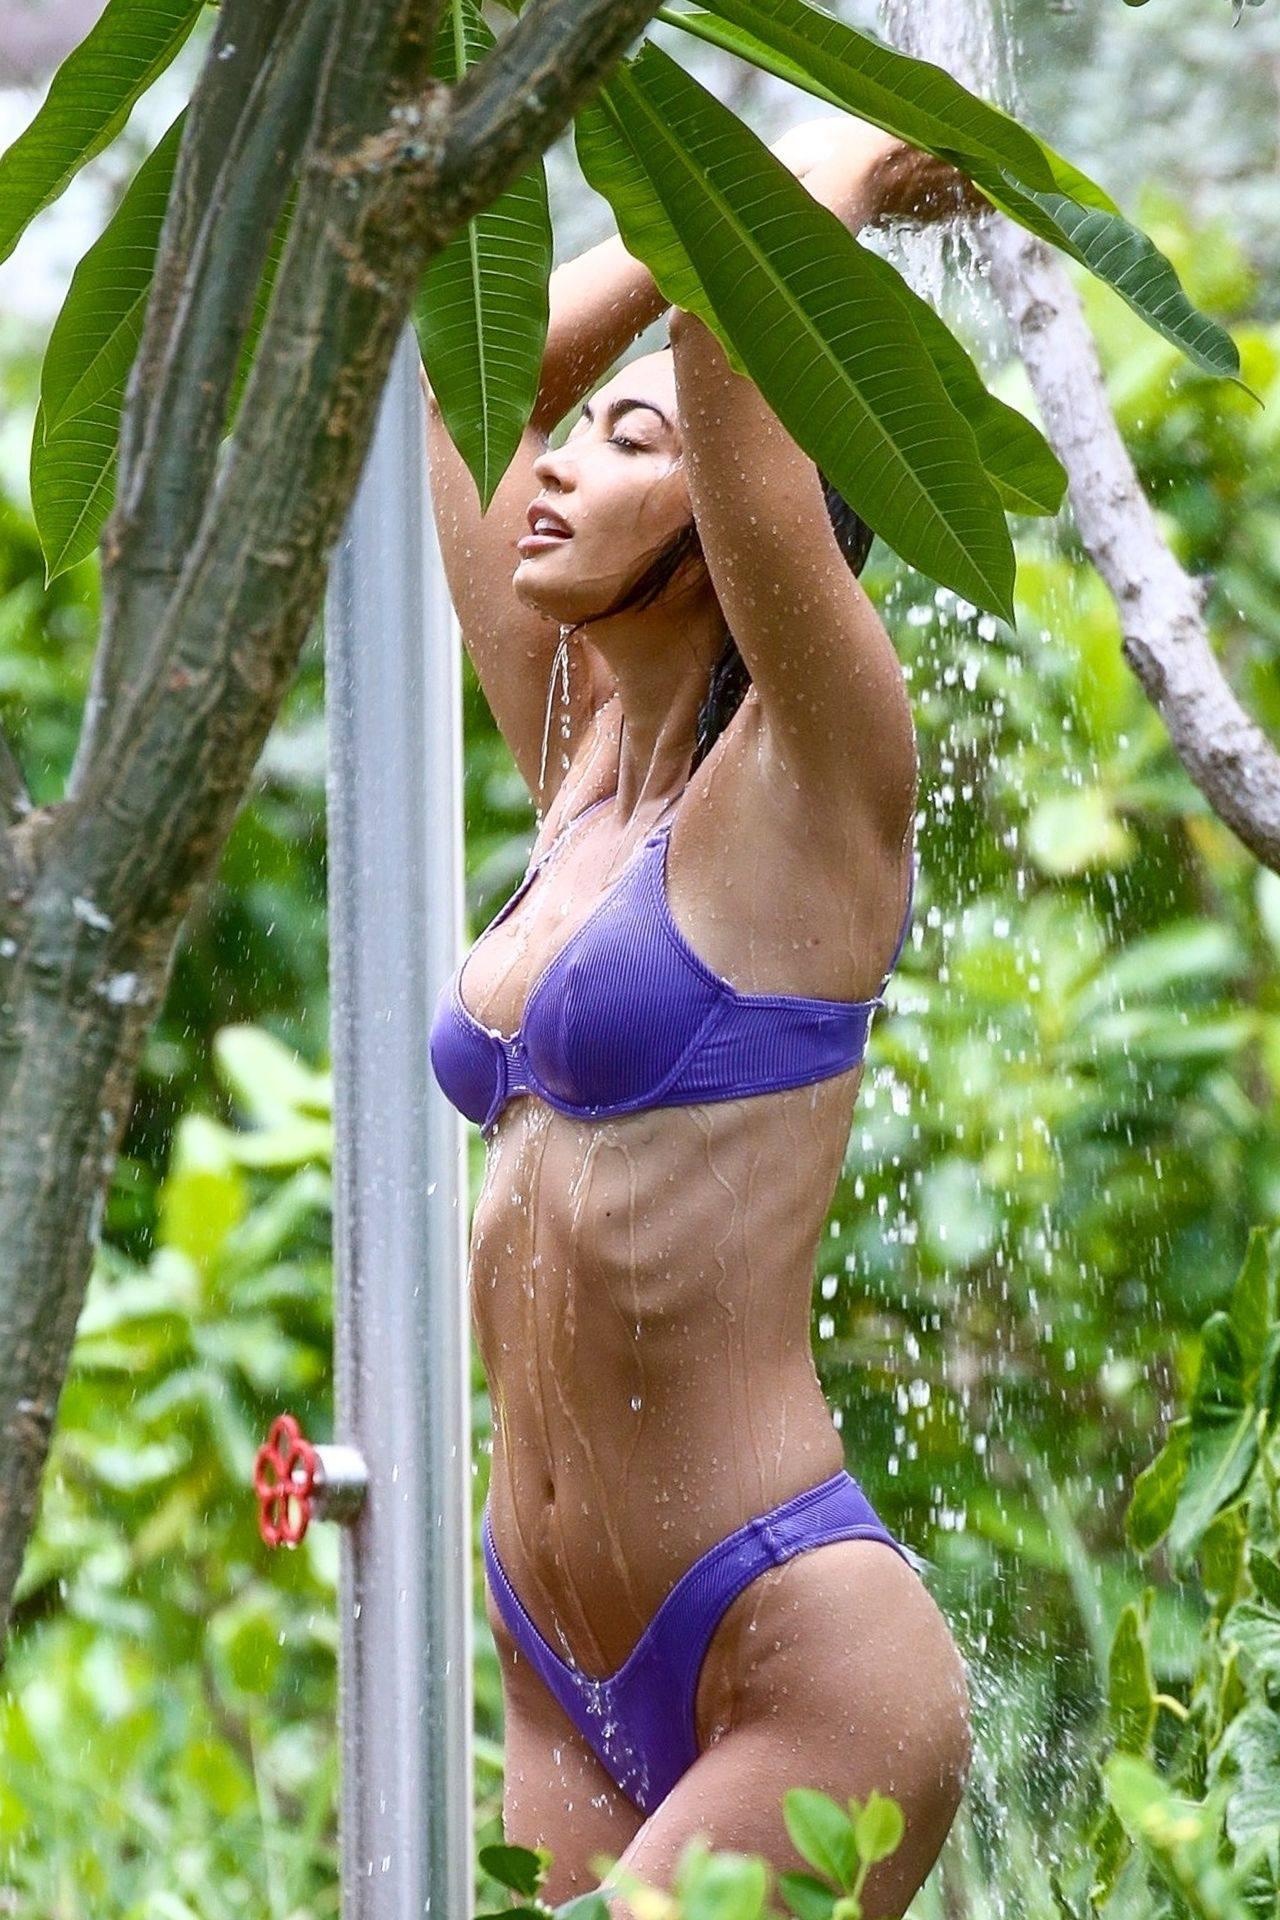 Ambra Gutierrez – Hot Body In Small Bikini On Beach In Miami Beach 0003